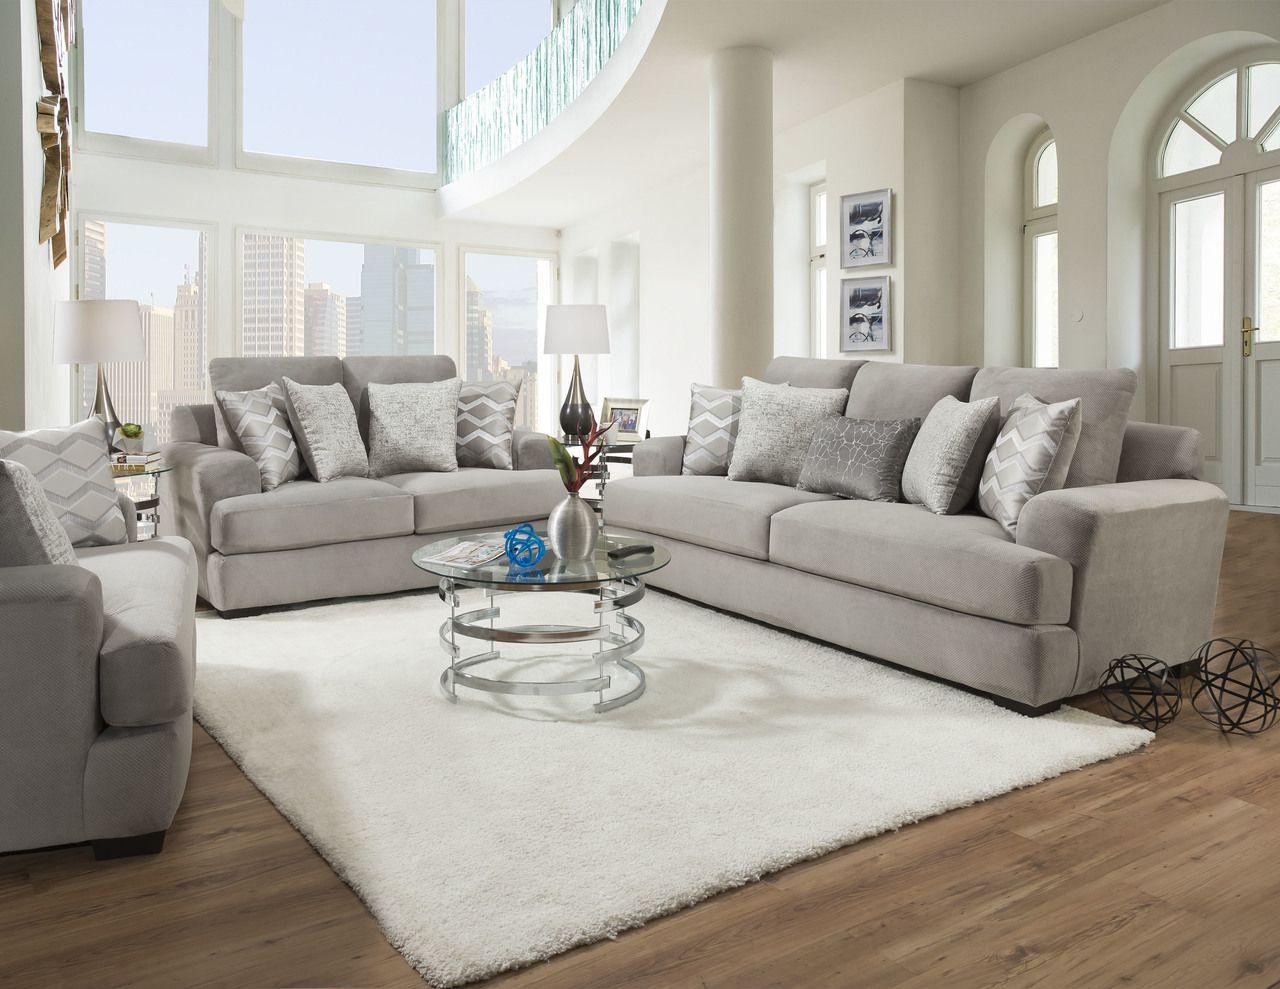 Corinthian Cooper Platinum Sofa Loveseat Set Sofa And Loveseat Set Elegant Living Room Decor Loveseat Living Room